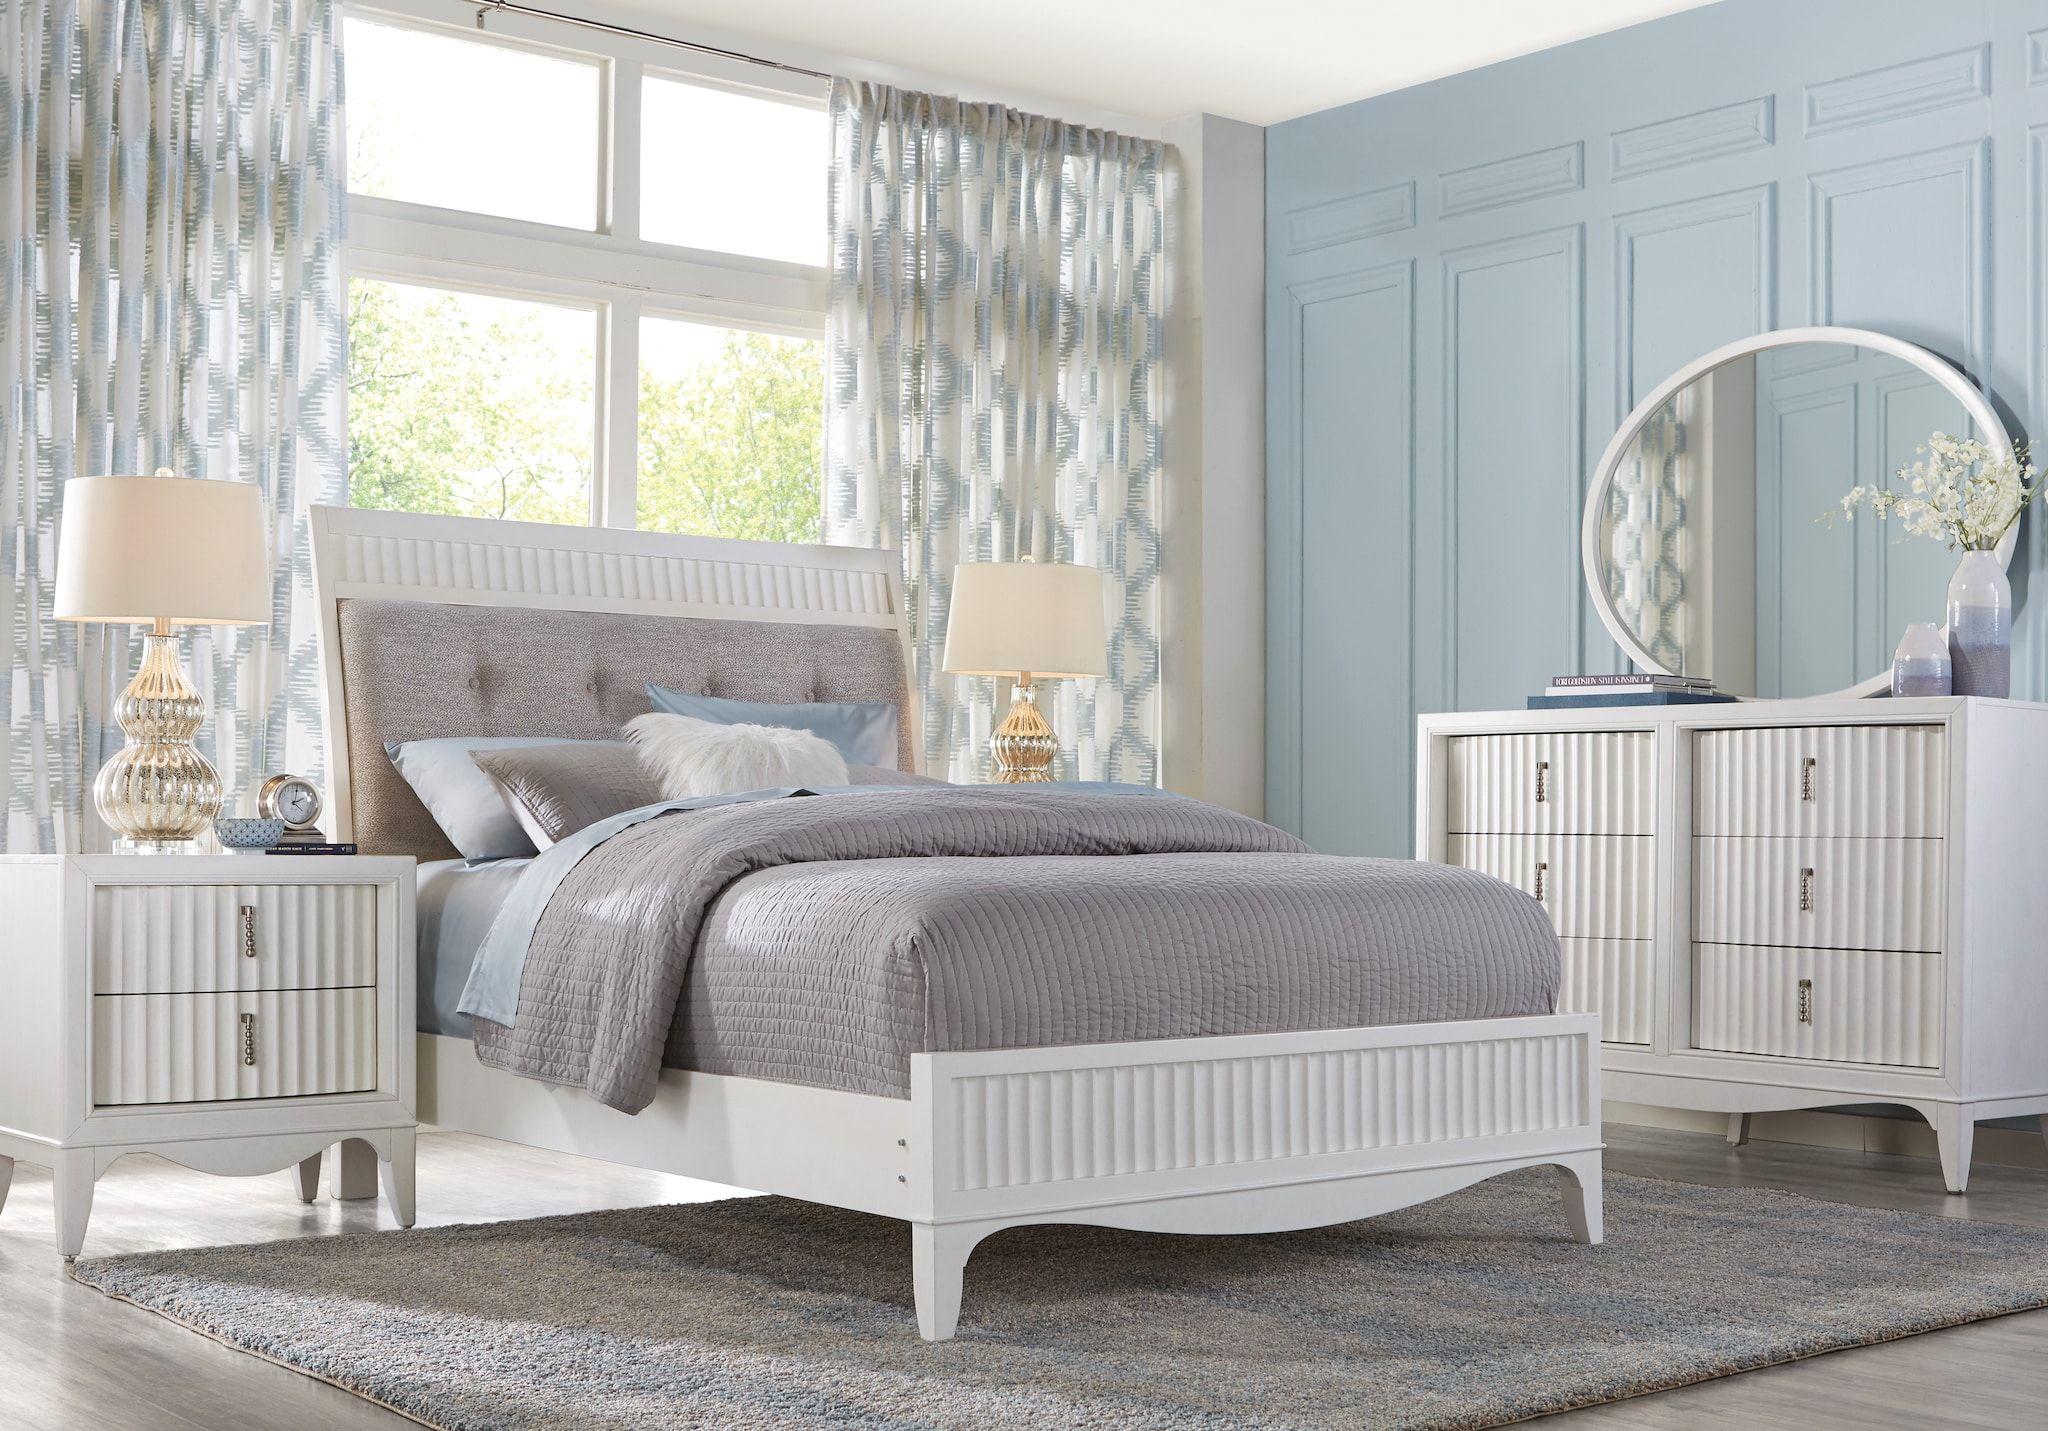 Best White Queen Bedroom Sets For Sale 5 6 Piece Suites 400 x 300